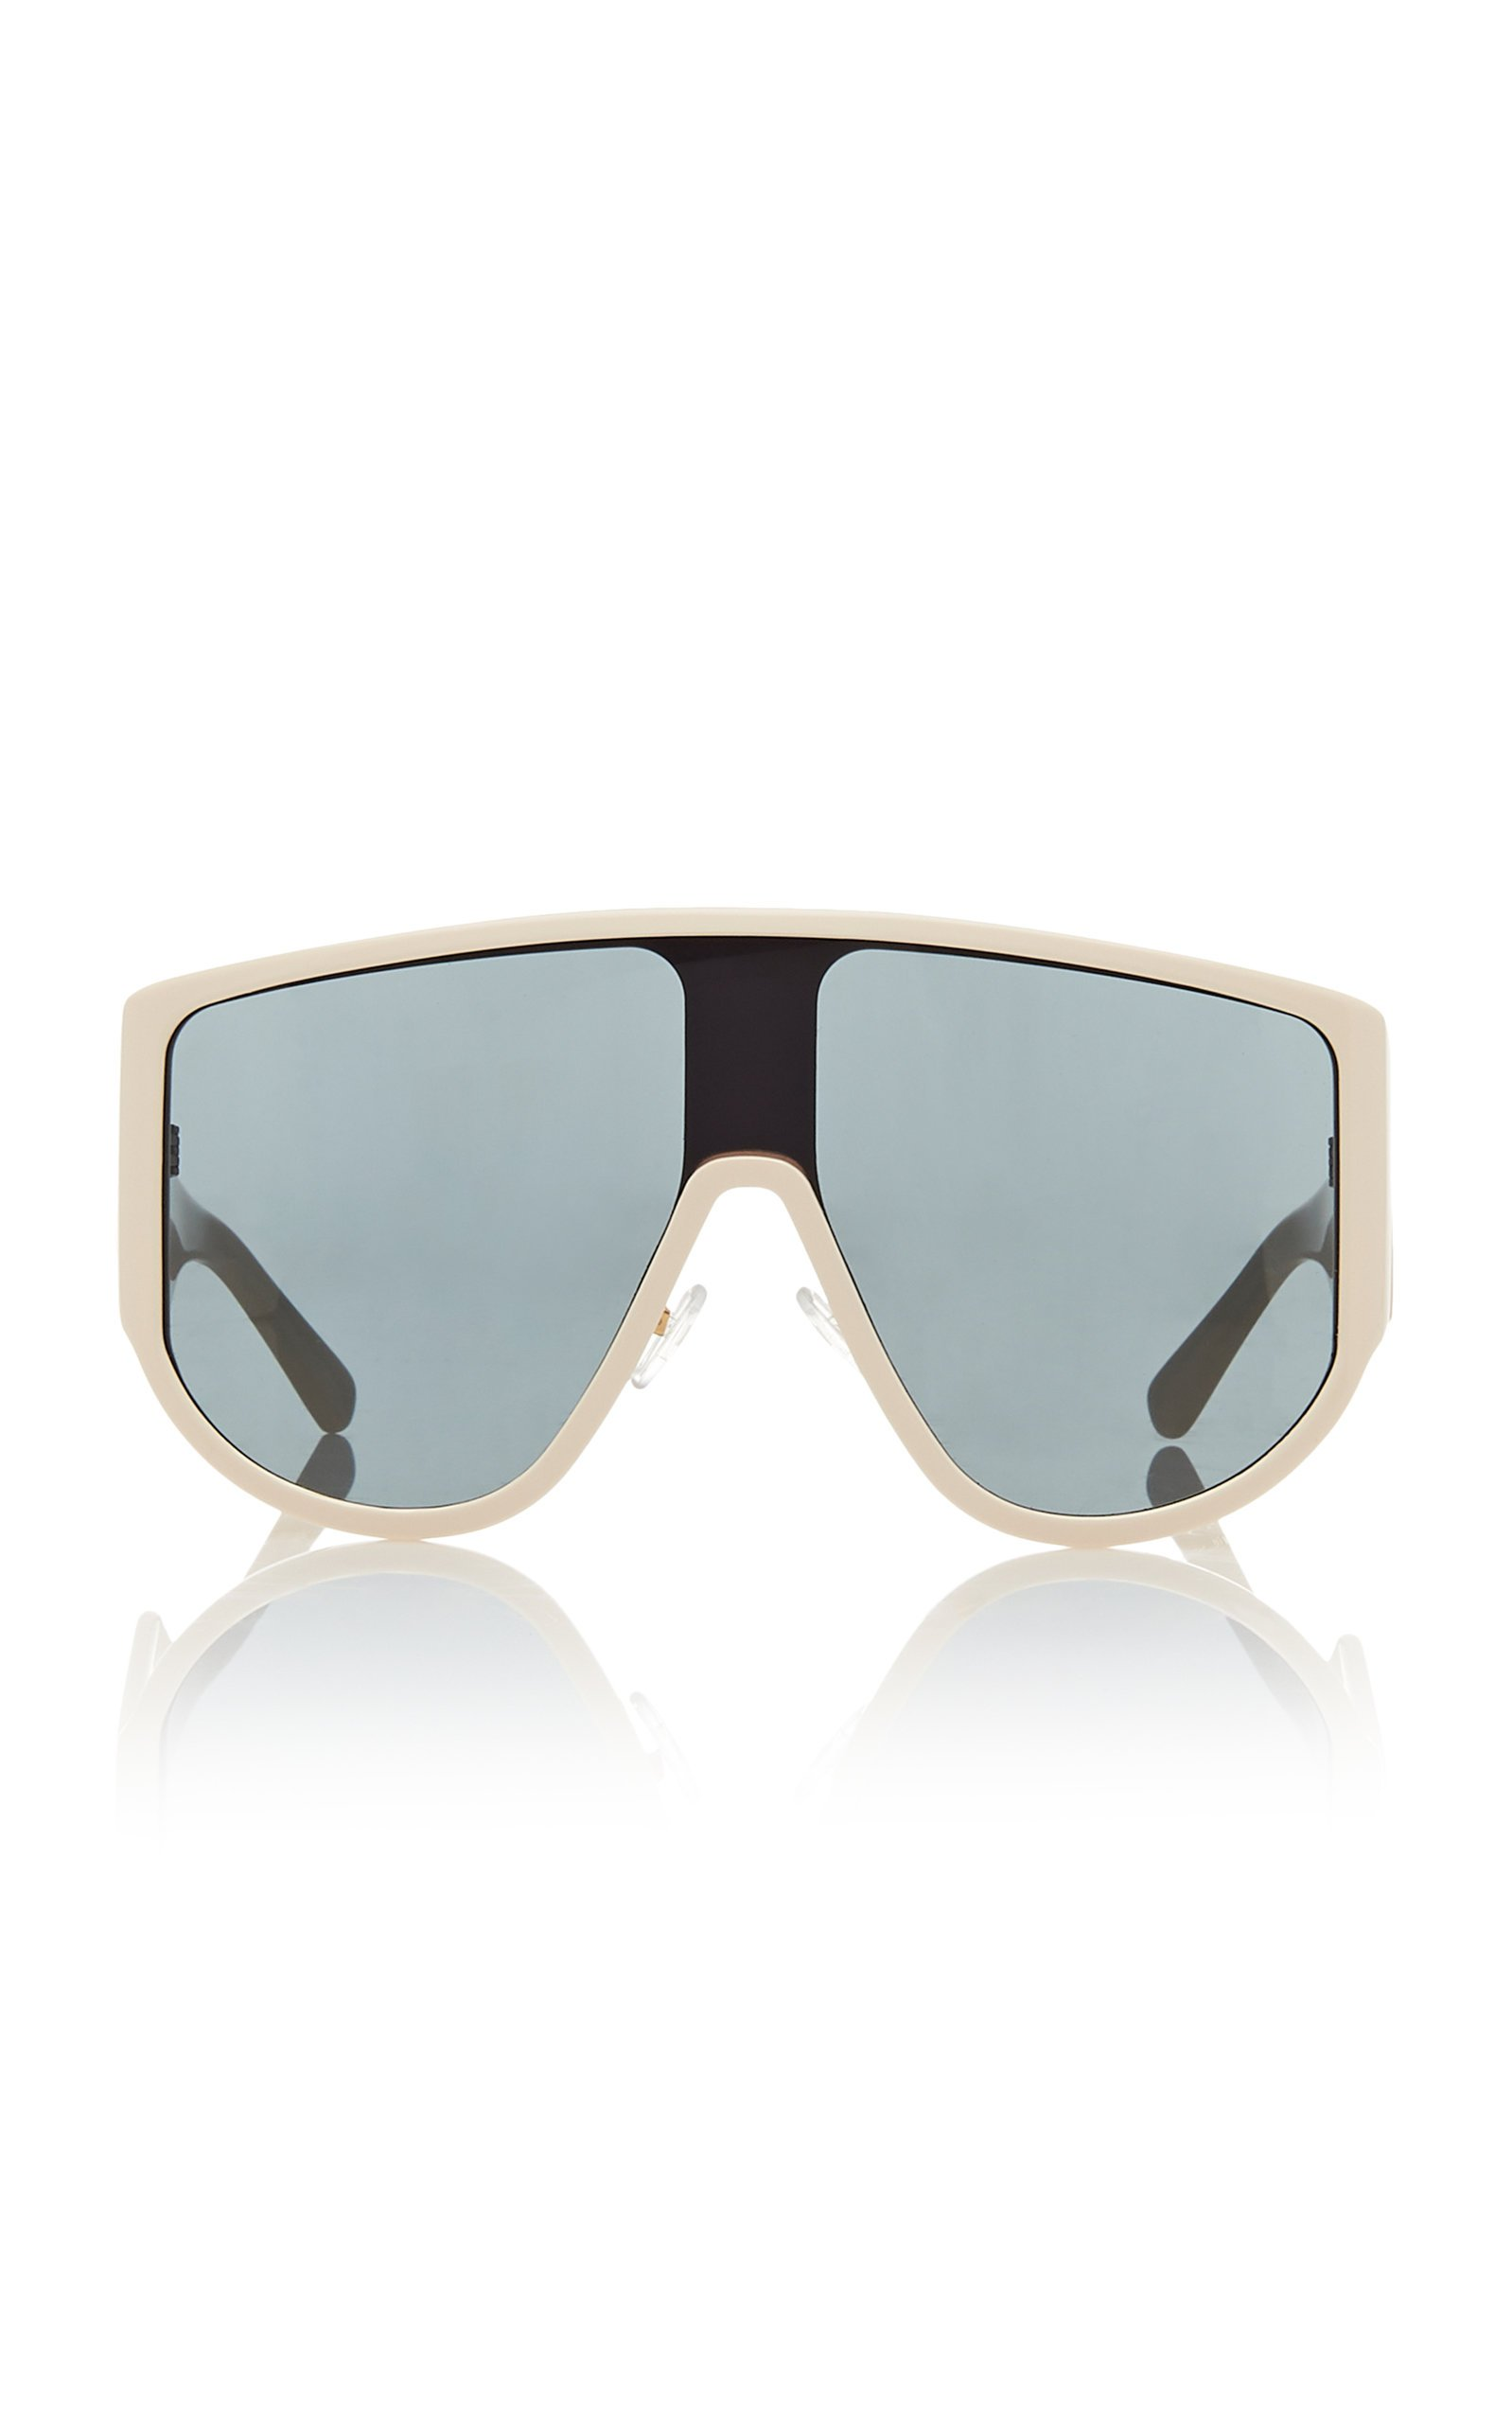 Attico x Linda Farrow Iman Acetate Shield Sunglasses